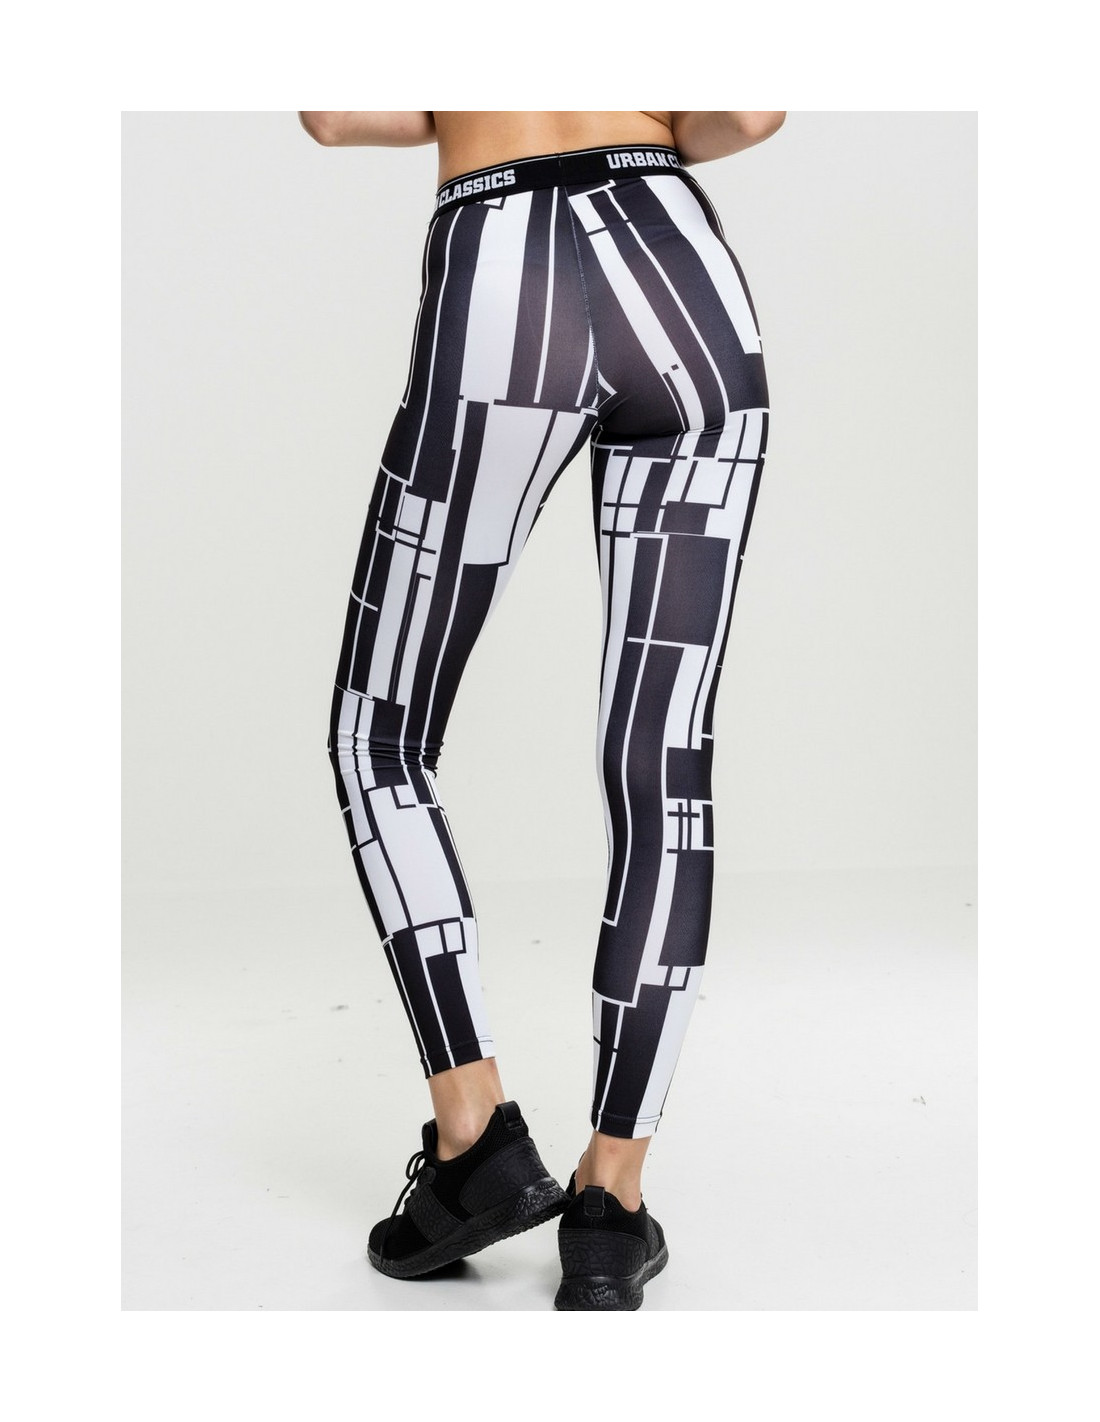 Ladies Graphic Sports Leggings Black/White